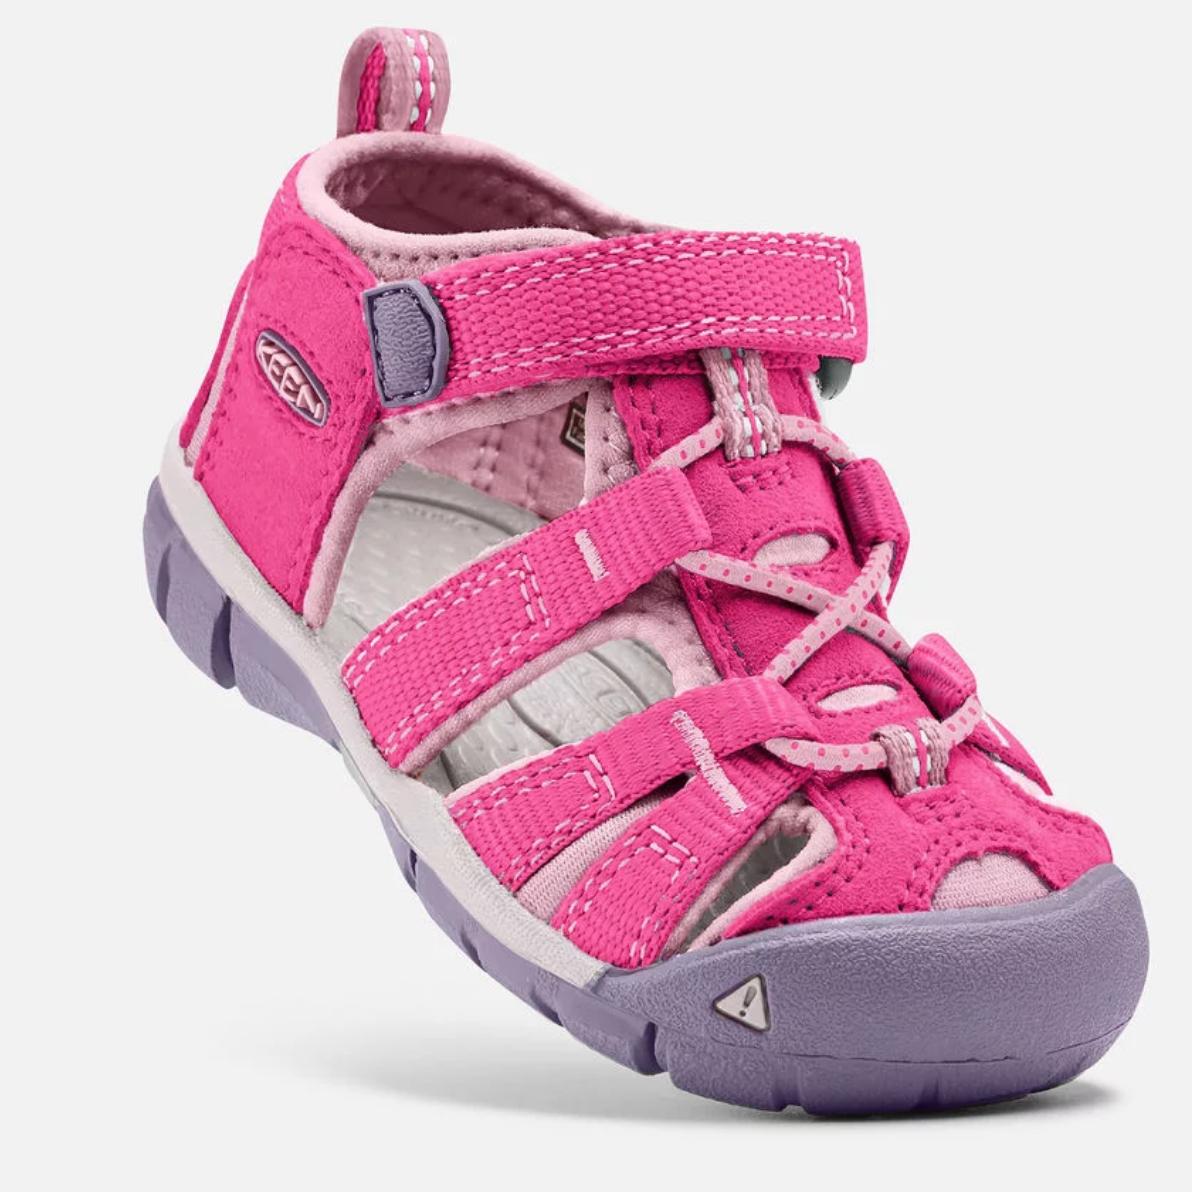 ad8957bf6631 Keen Seacamp II CNX Very Berry Lilac Chiffon Toddler